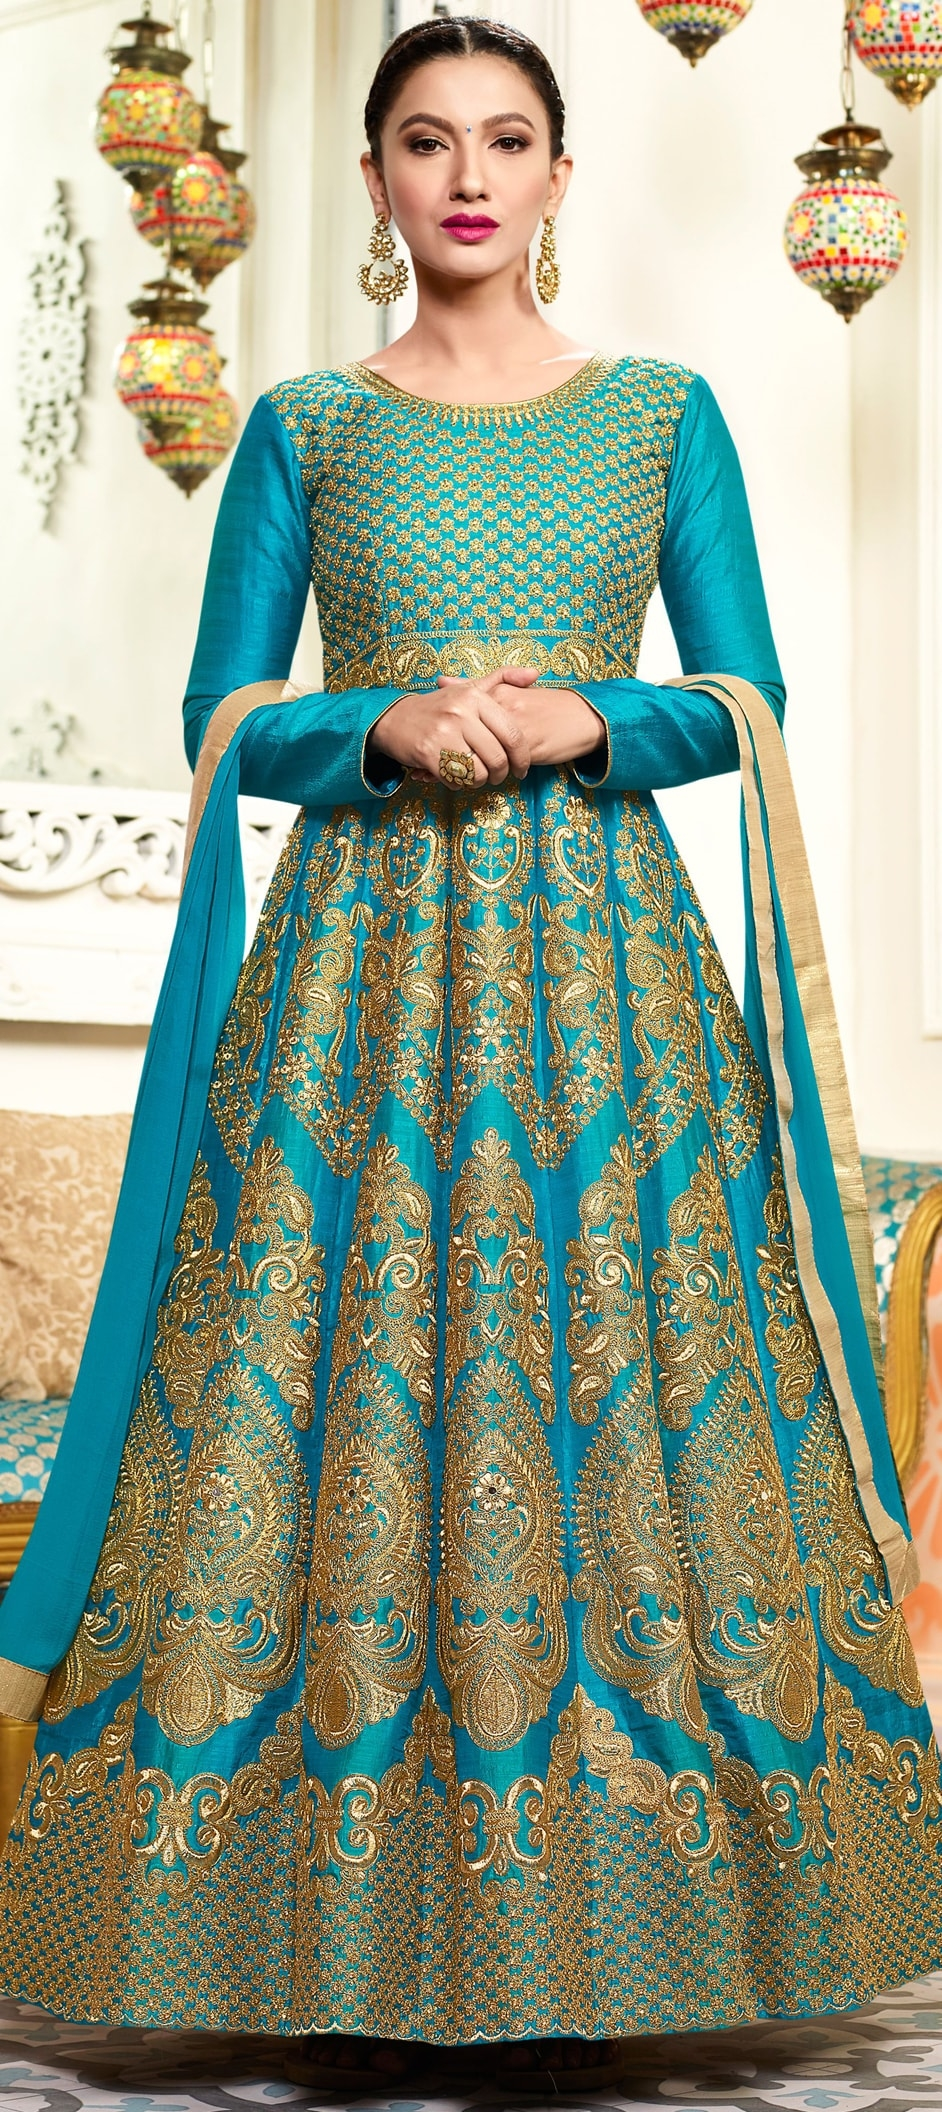 906430: Blue color family semi-stiched Anarkali Suits .